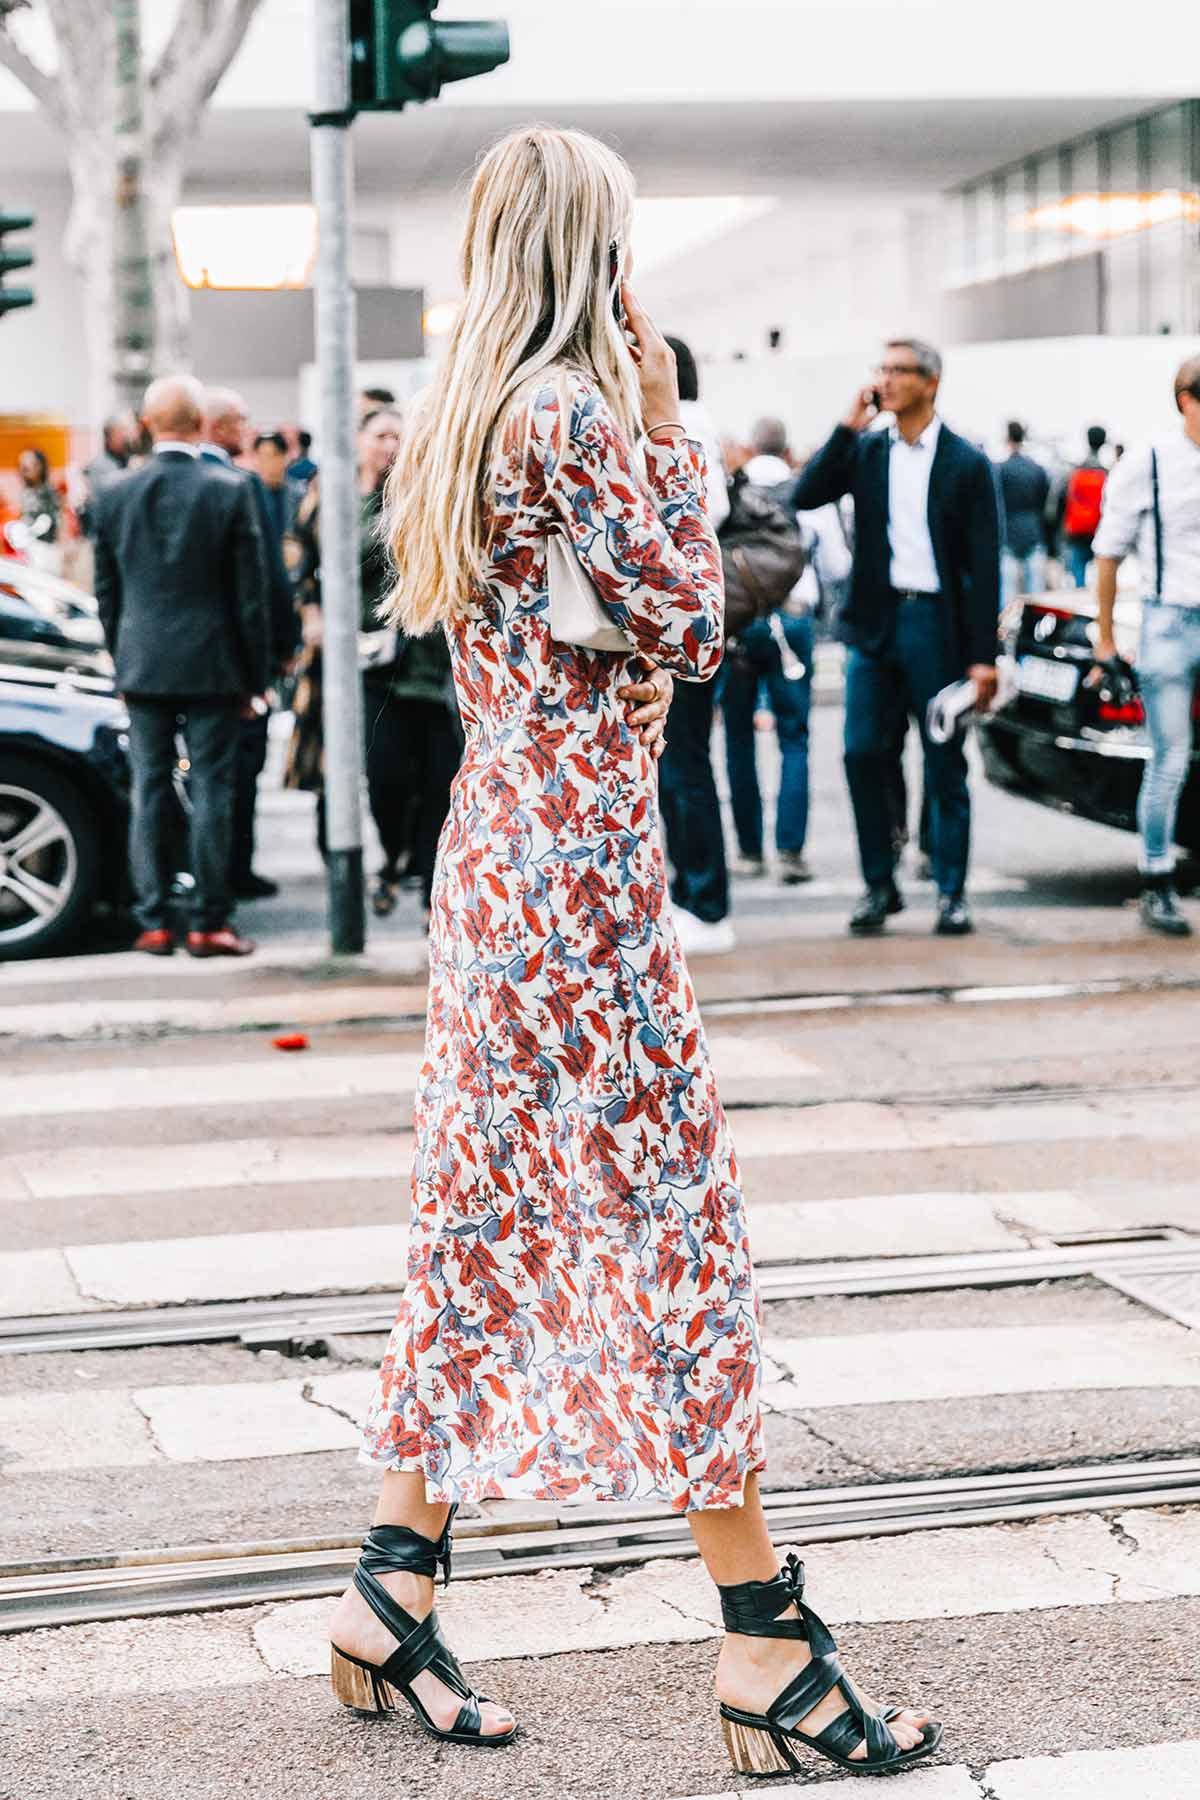 street_style_milan_fashion_week_dia_4_missoni_jil_sander_blumarine_962928391_1200x1800